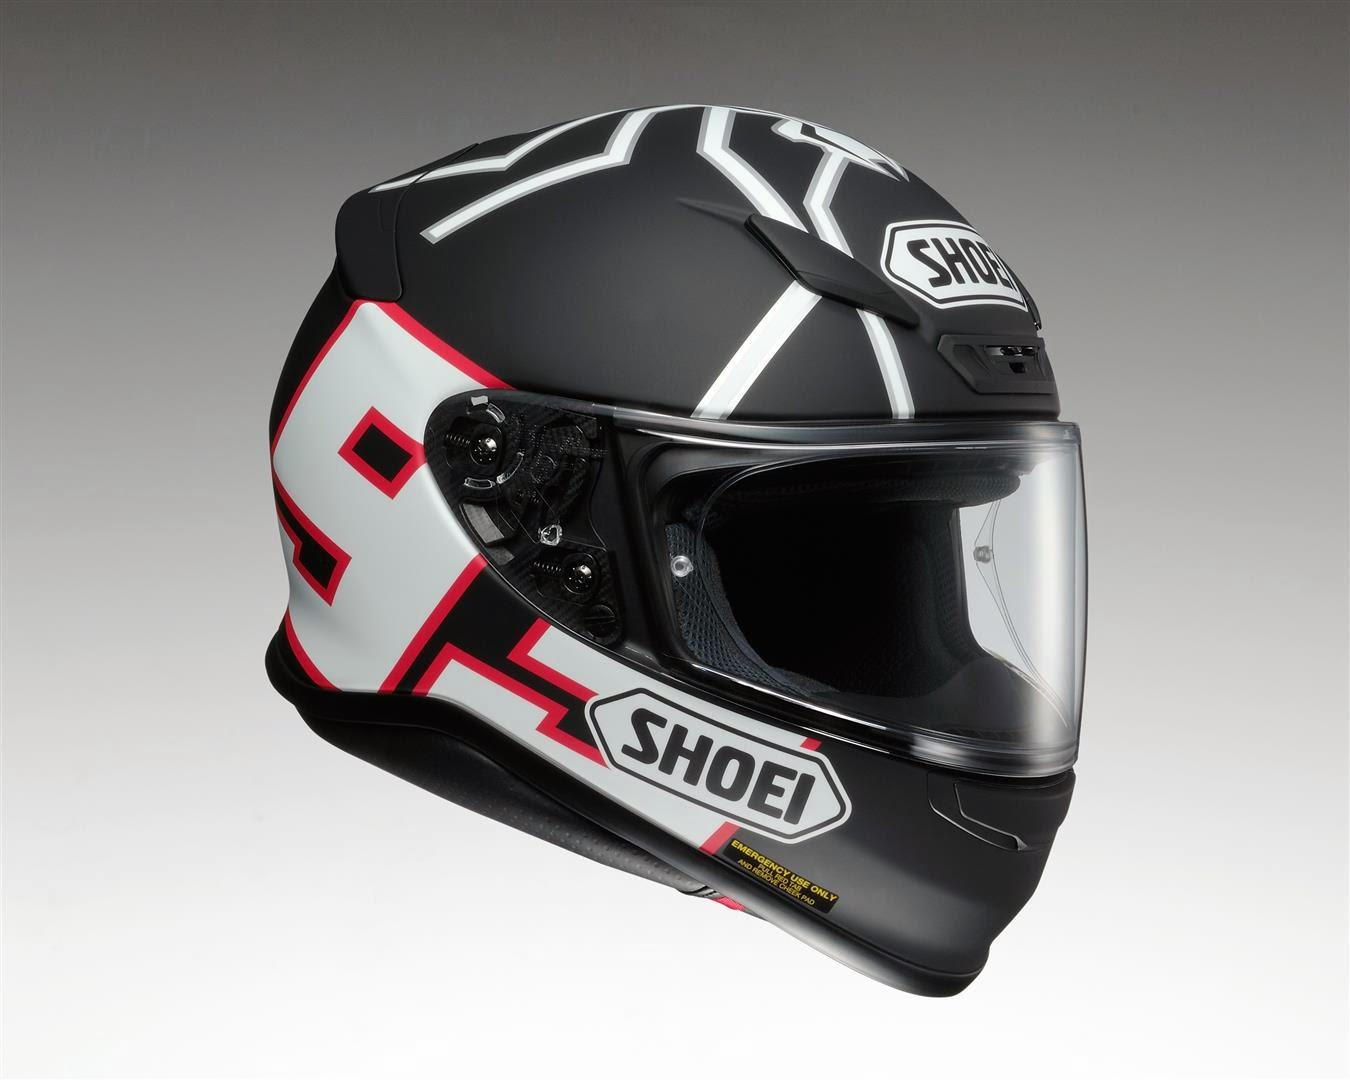 racing helmets garage shoei nxr replica marquez test